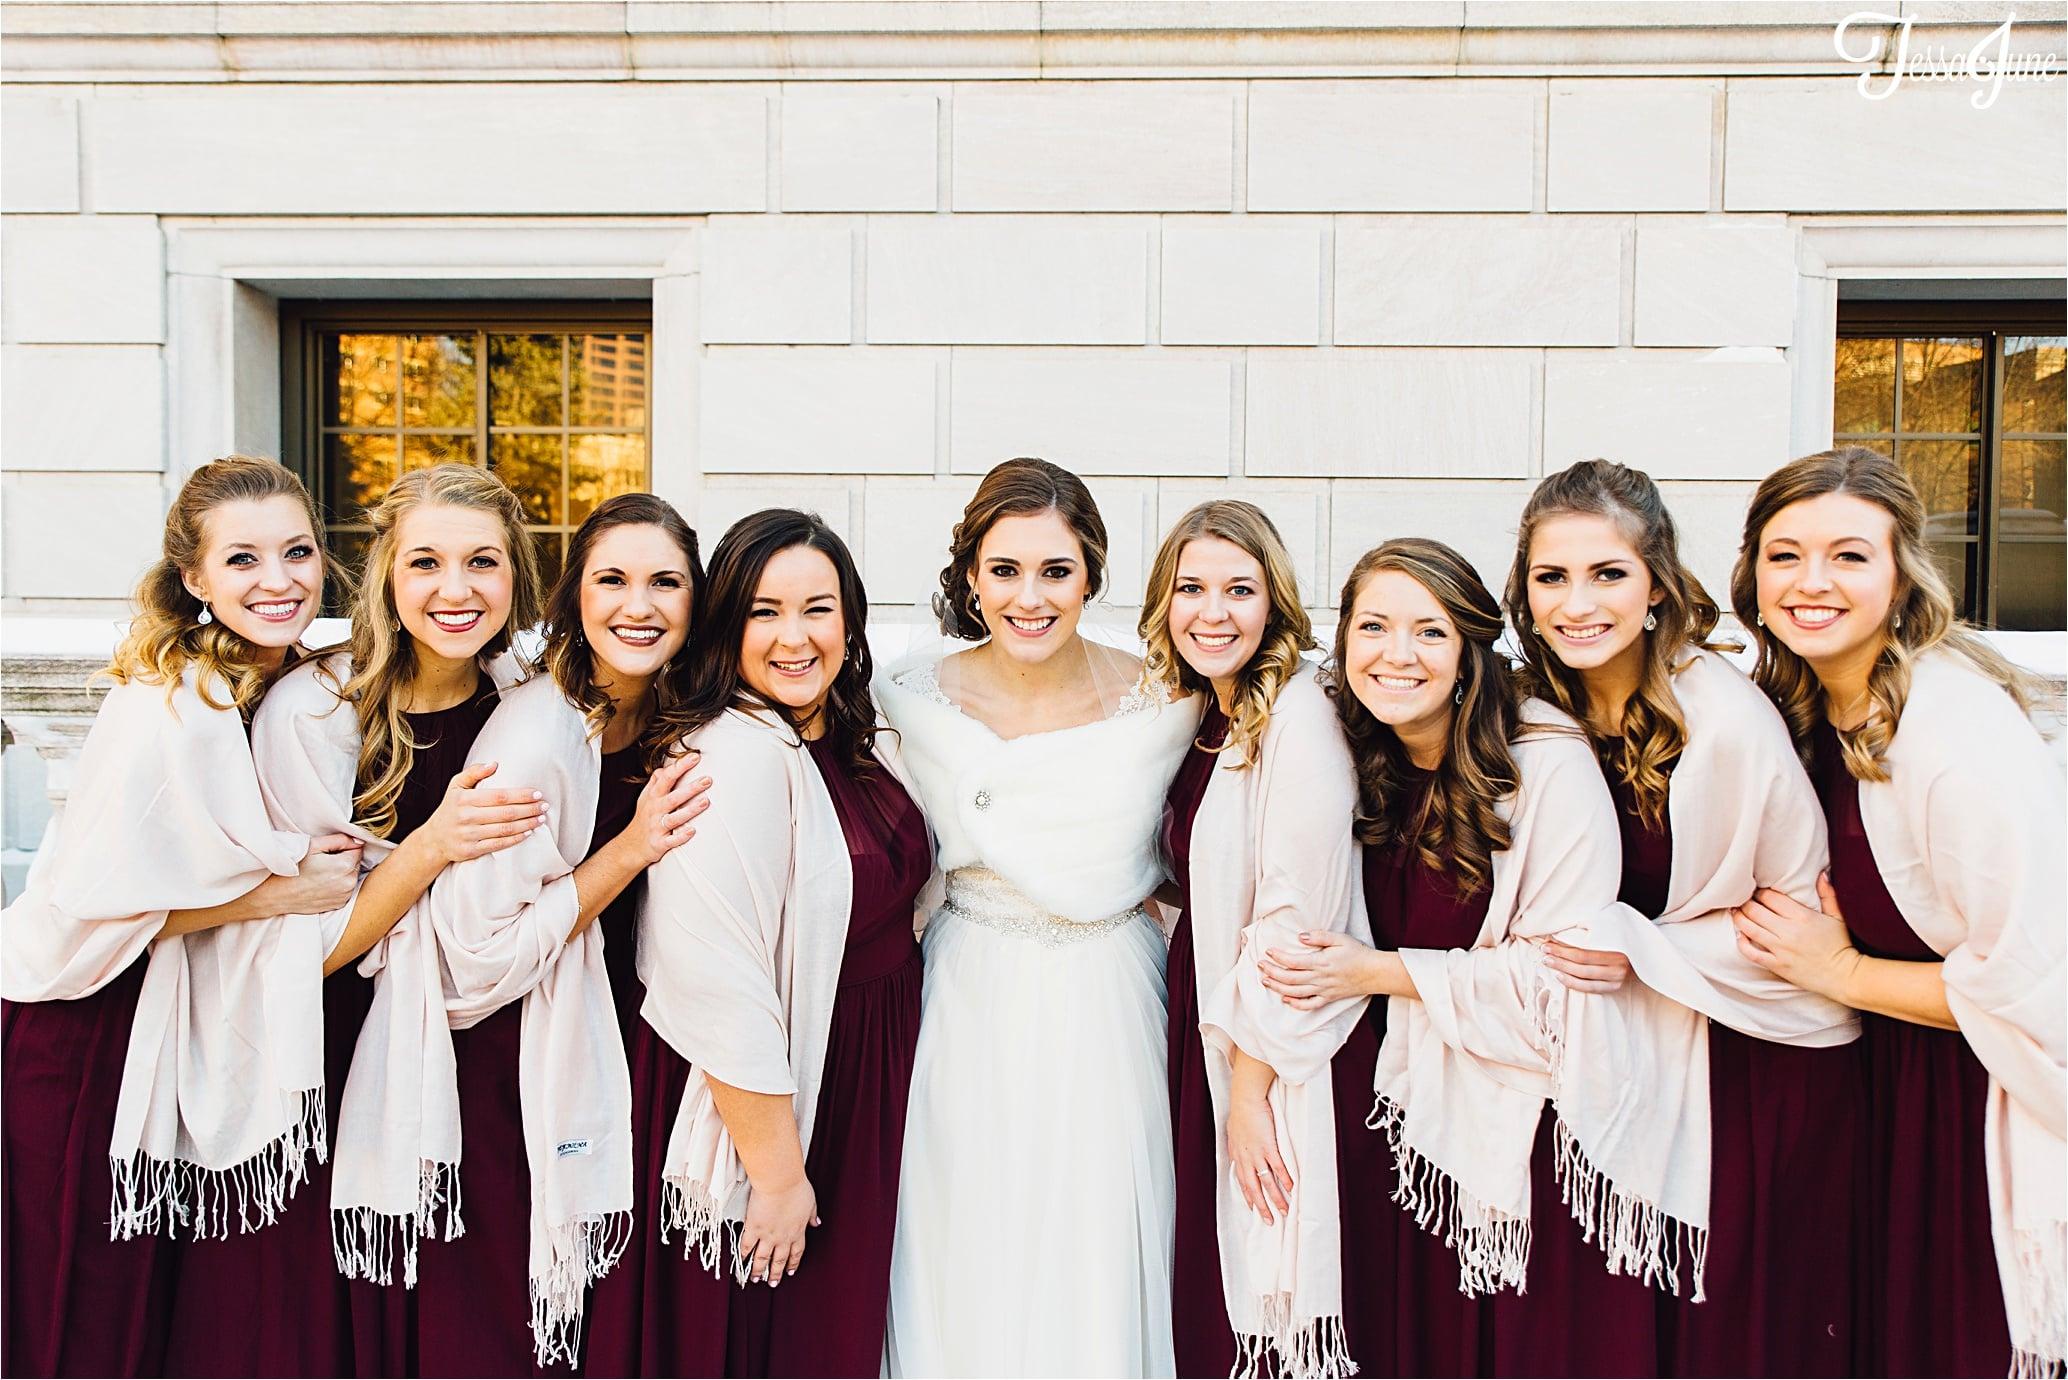 st-cloud-minnesota-wedding-photographer-rice-park-winter-maroon-bridesmaids